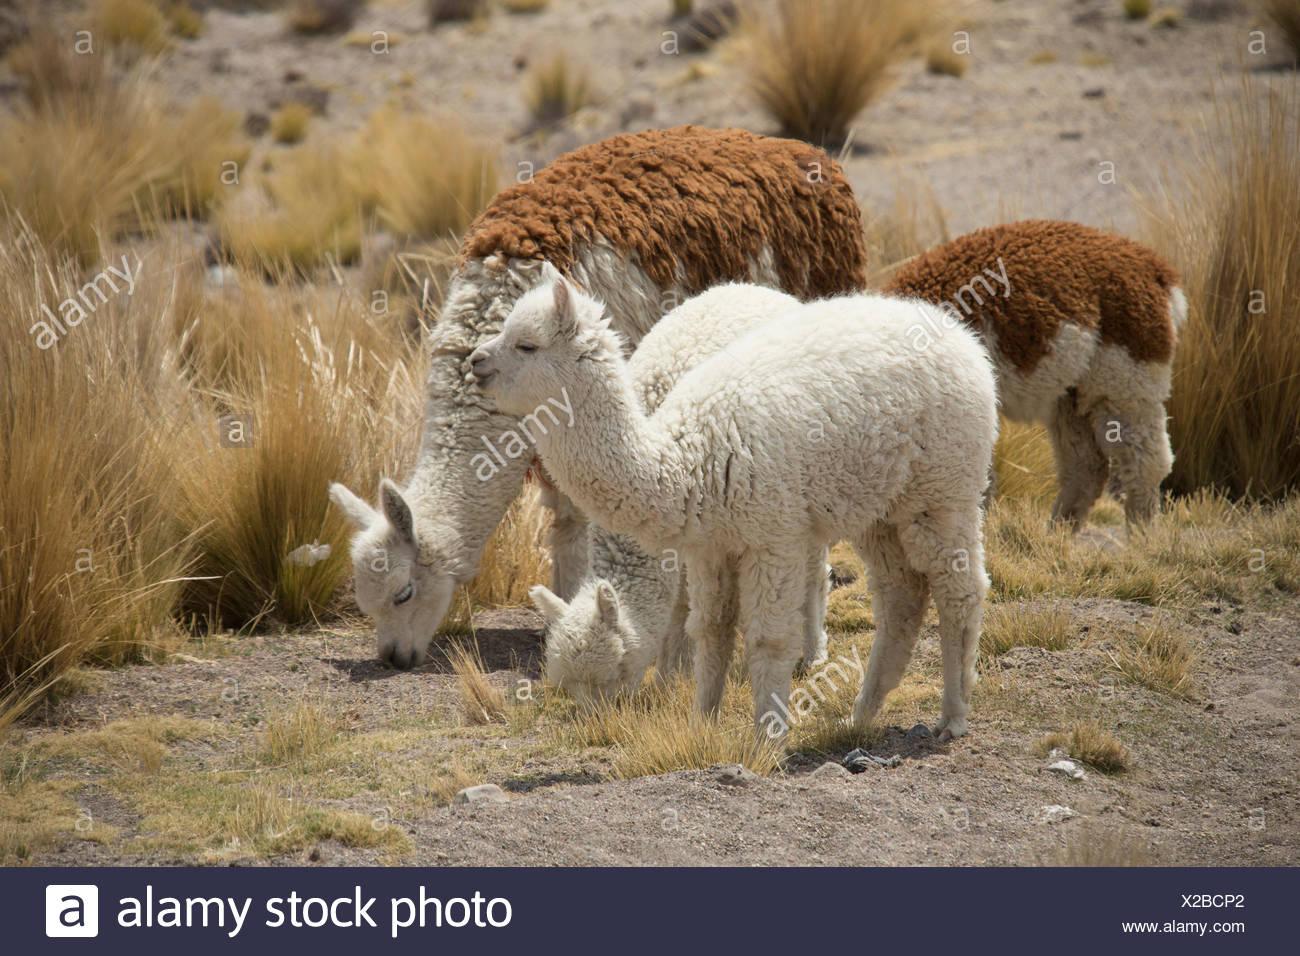 Alpacas in the Zona de Vicunas, Stock Photo